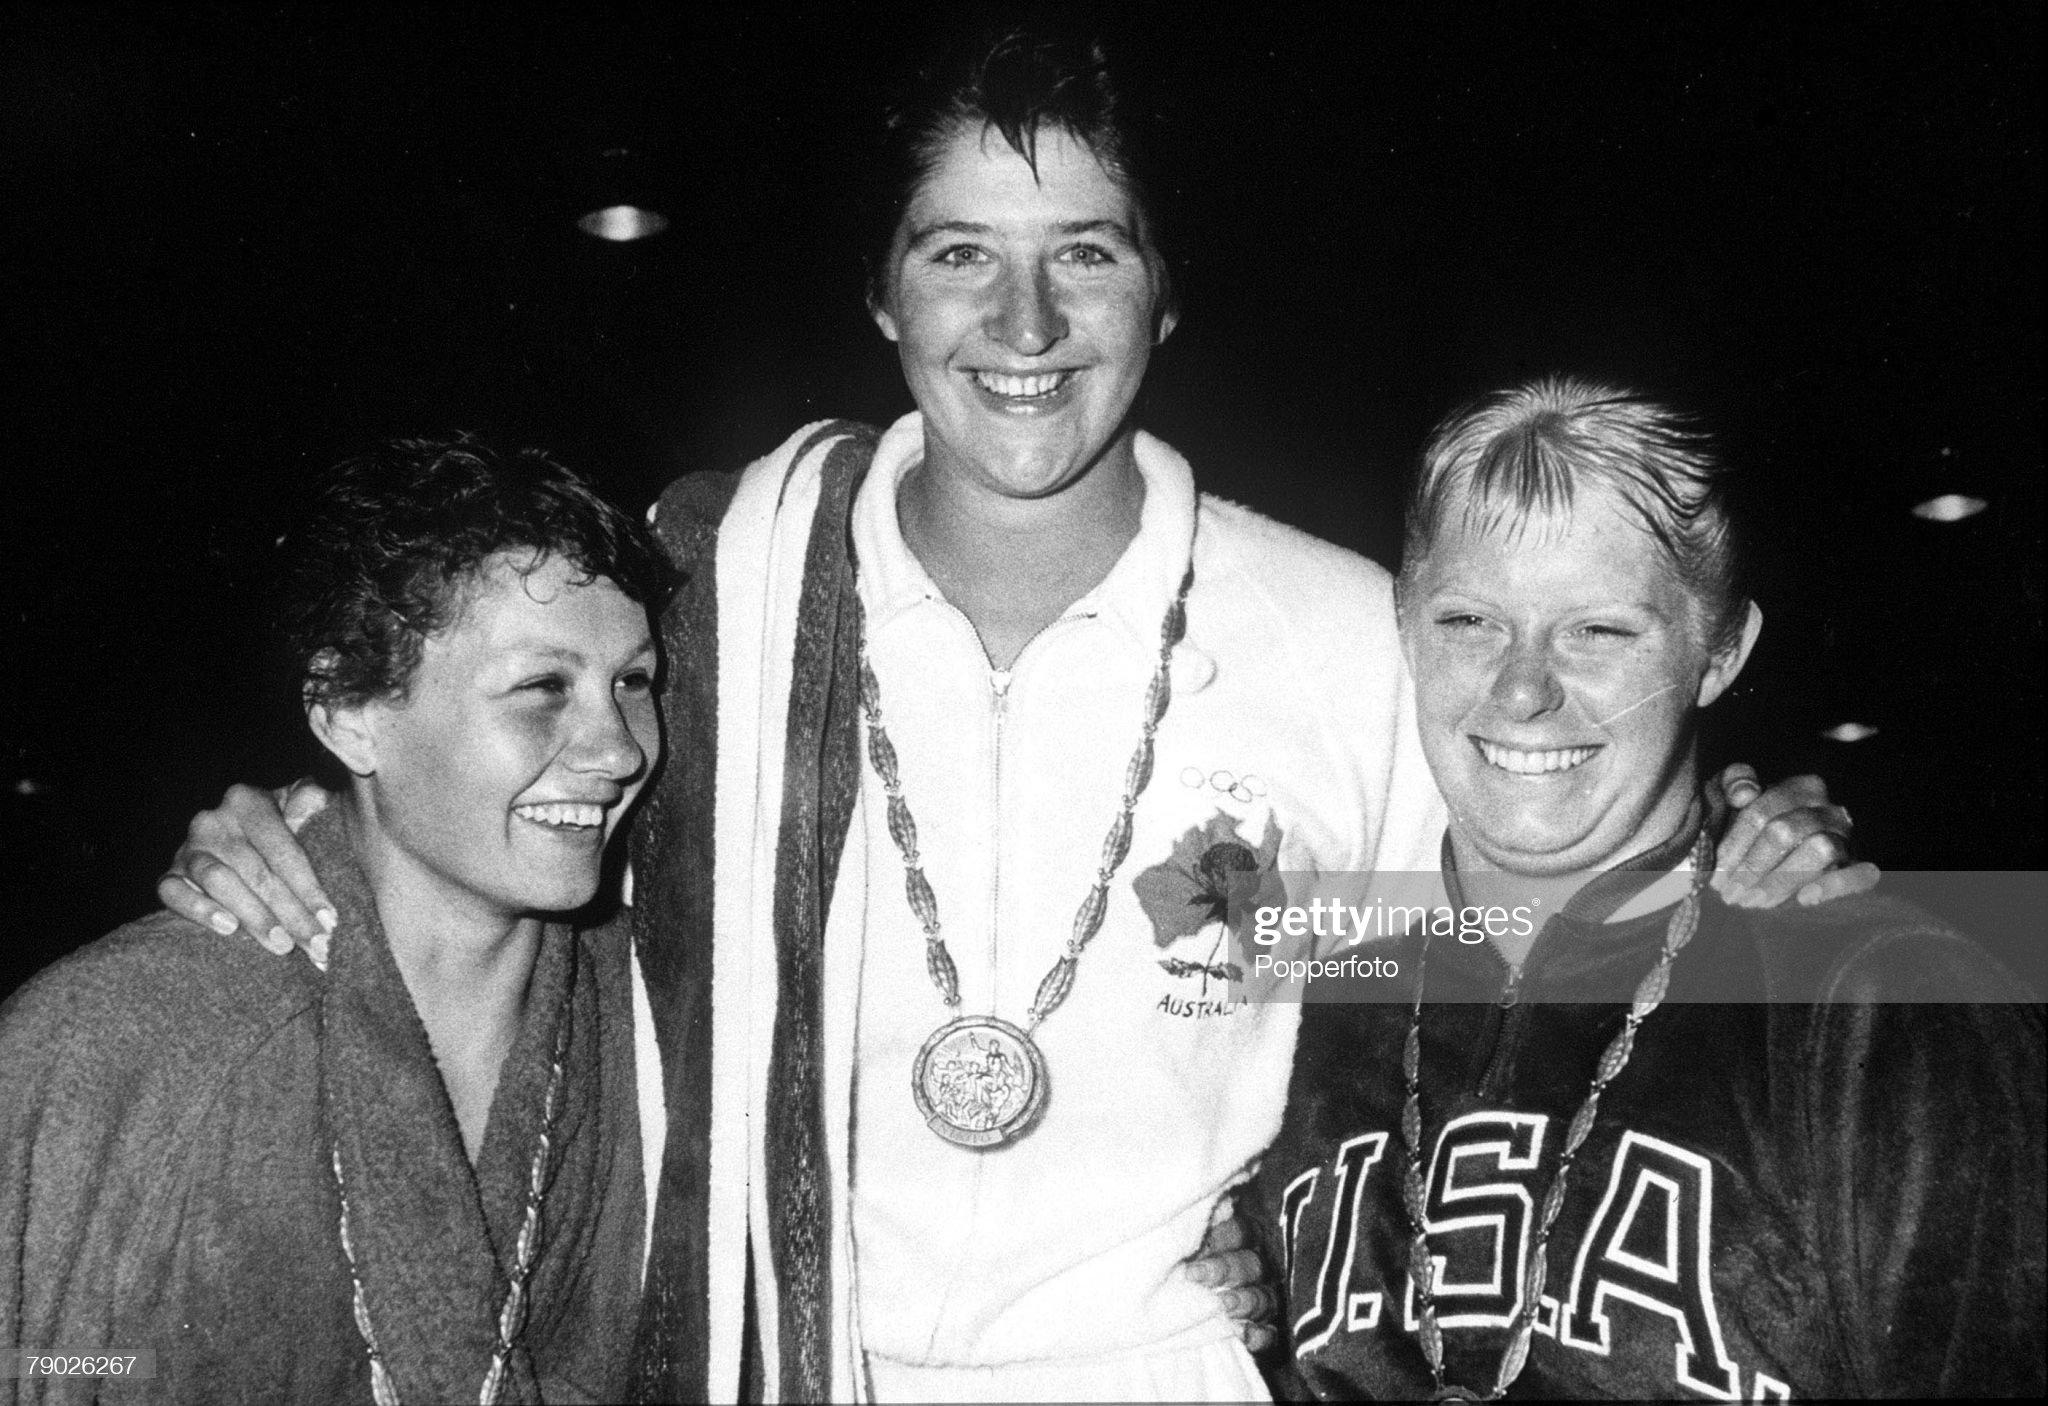 1960 Olympic Games. Rome, Italy. Swimming. Women's 100 Metres Freestyle. Australian gold medallist Dawn Fraser with USA' silver medallist Christine Von Saltza (R) and Great Britain's Natalie Steward who took bronze. : Fotografía de noticias